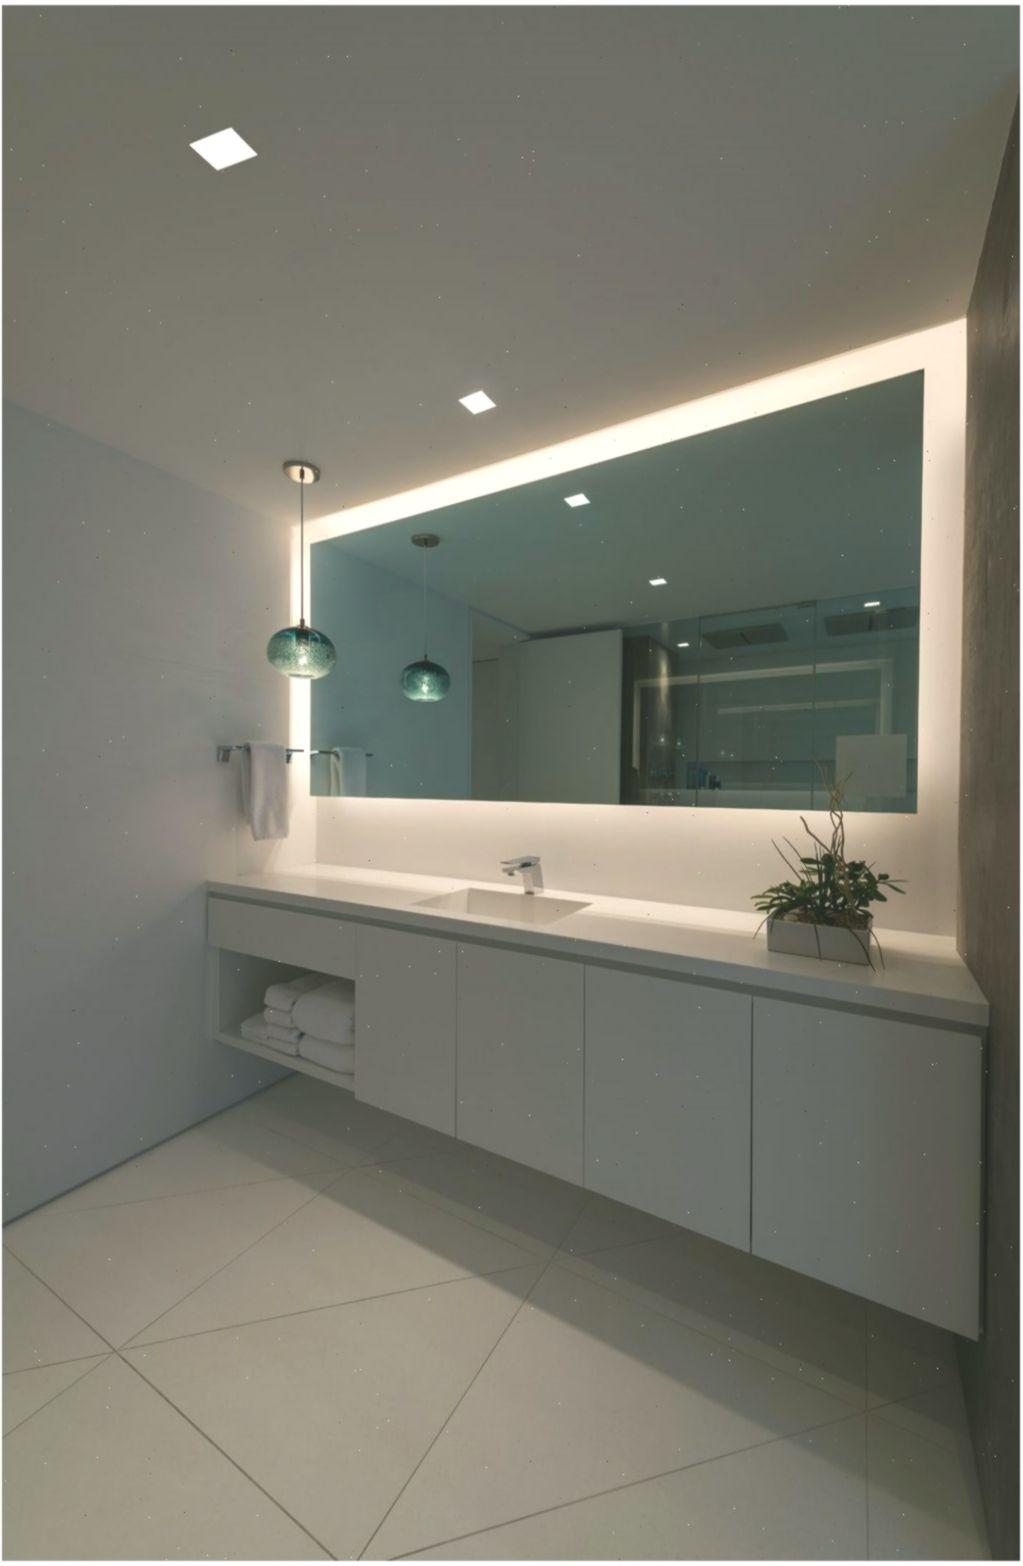 Moderne Badezimmer Spiegel Ideen Moderne Badezimmer Spiegel Ideen Mit So V Modern Bathroom Mirrors Bathroom Mirror Design Large Bathroom Mirrors